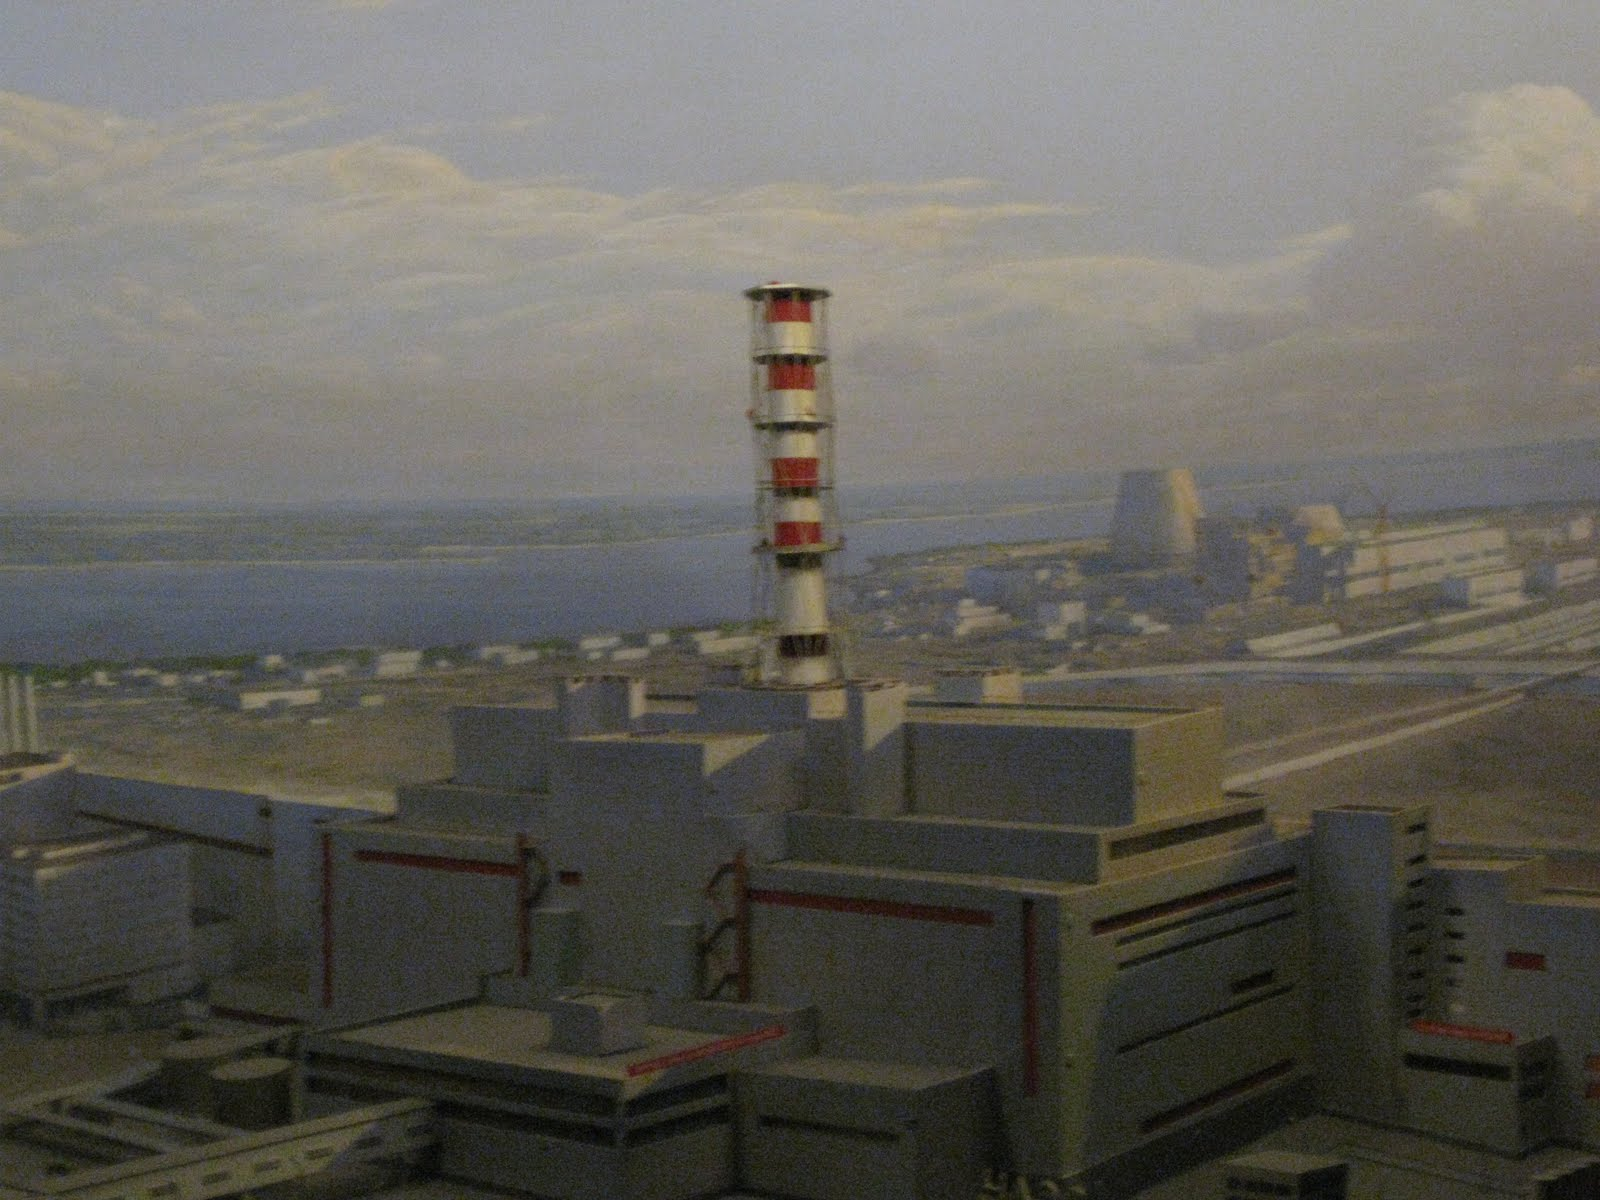 Chernobyl Befor... Chernobyl Before 1986